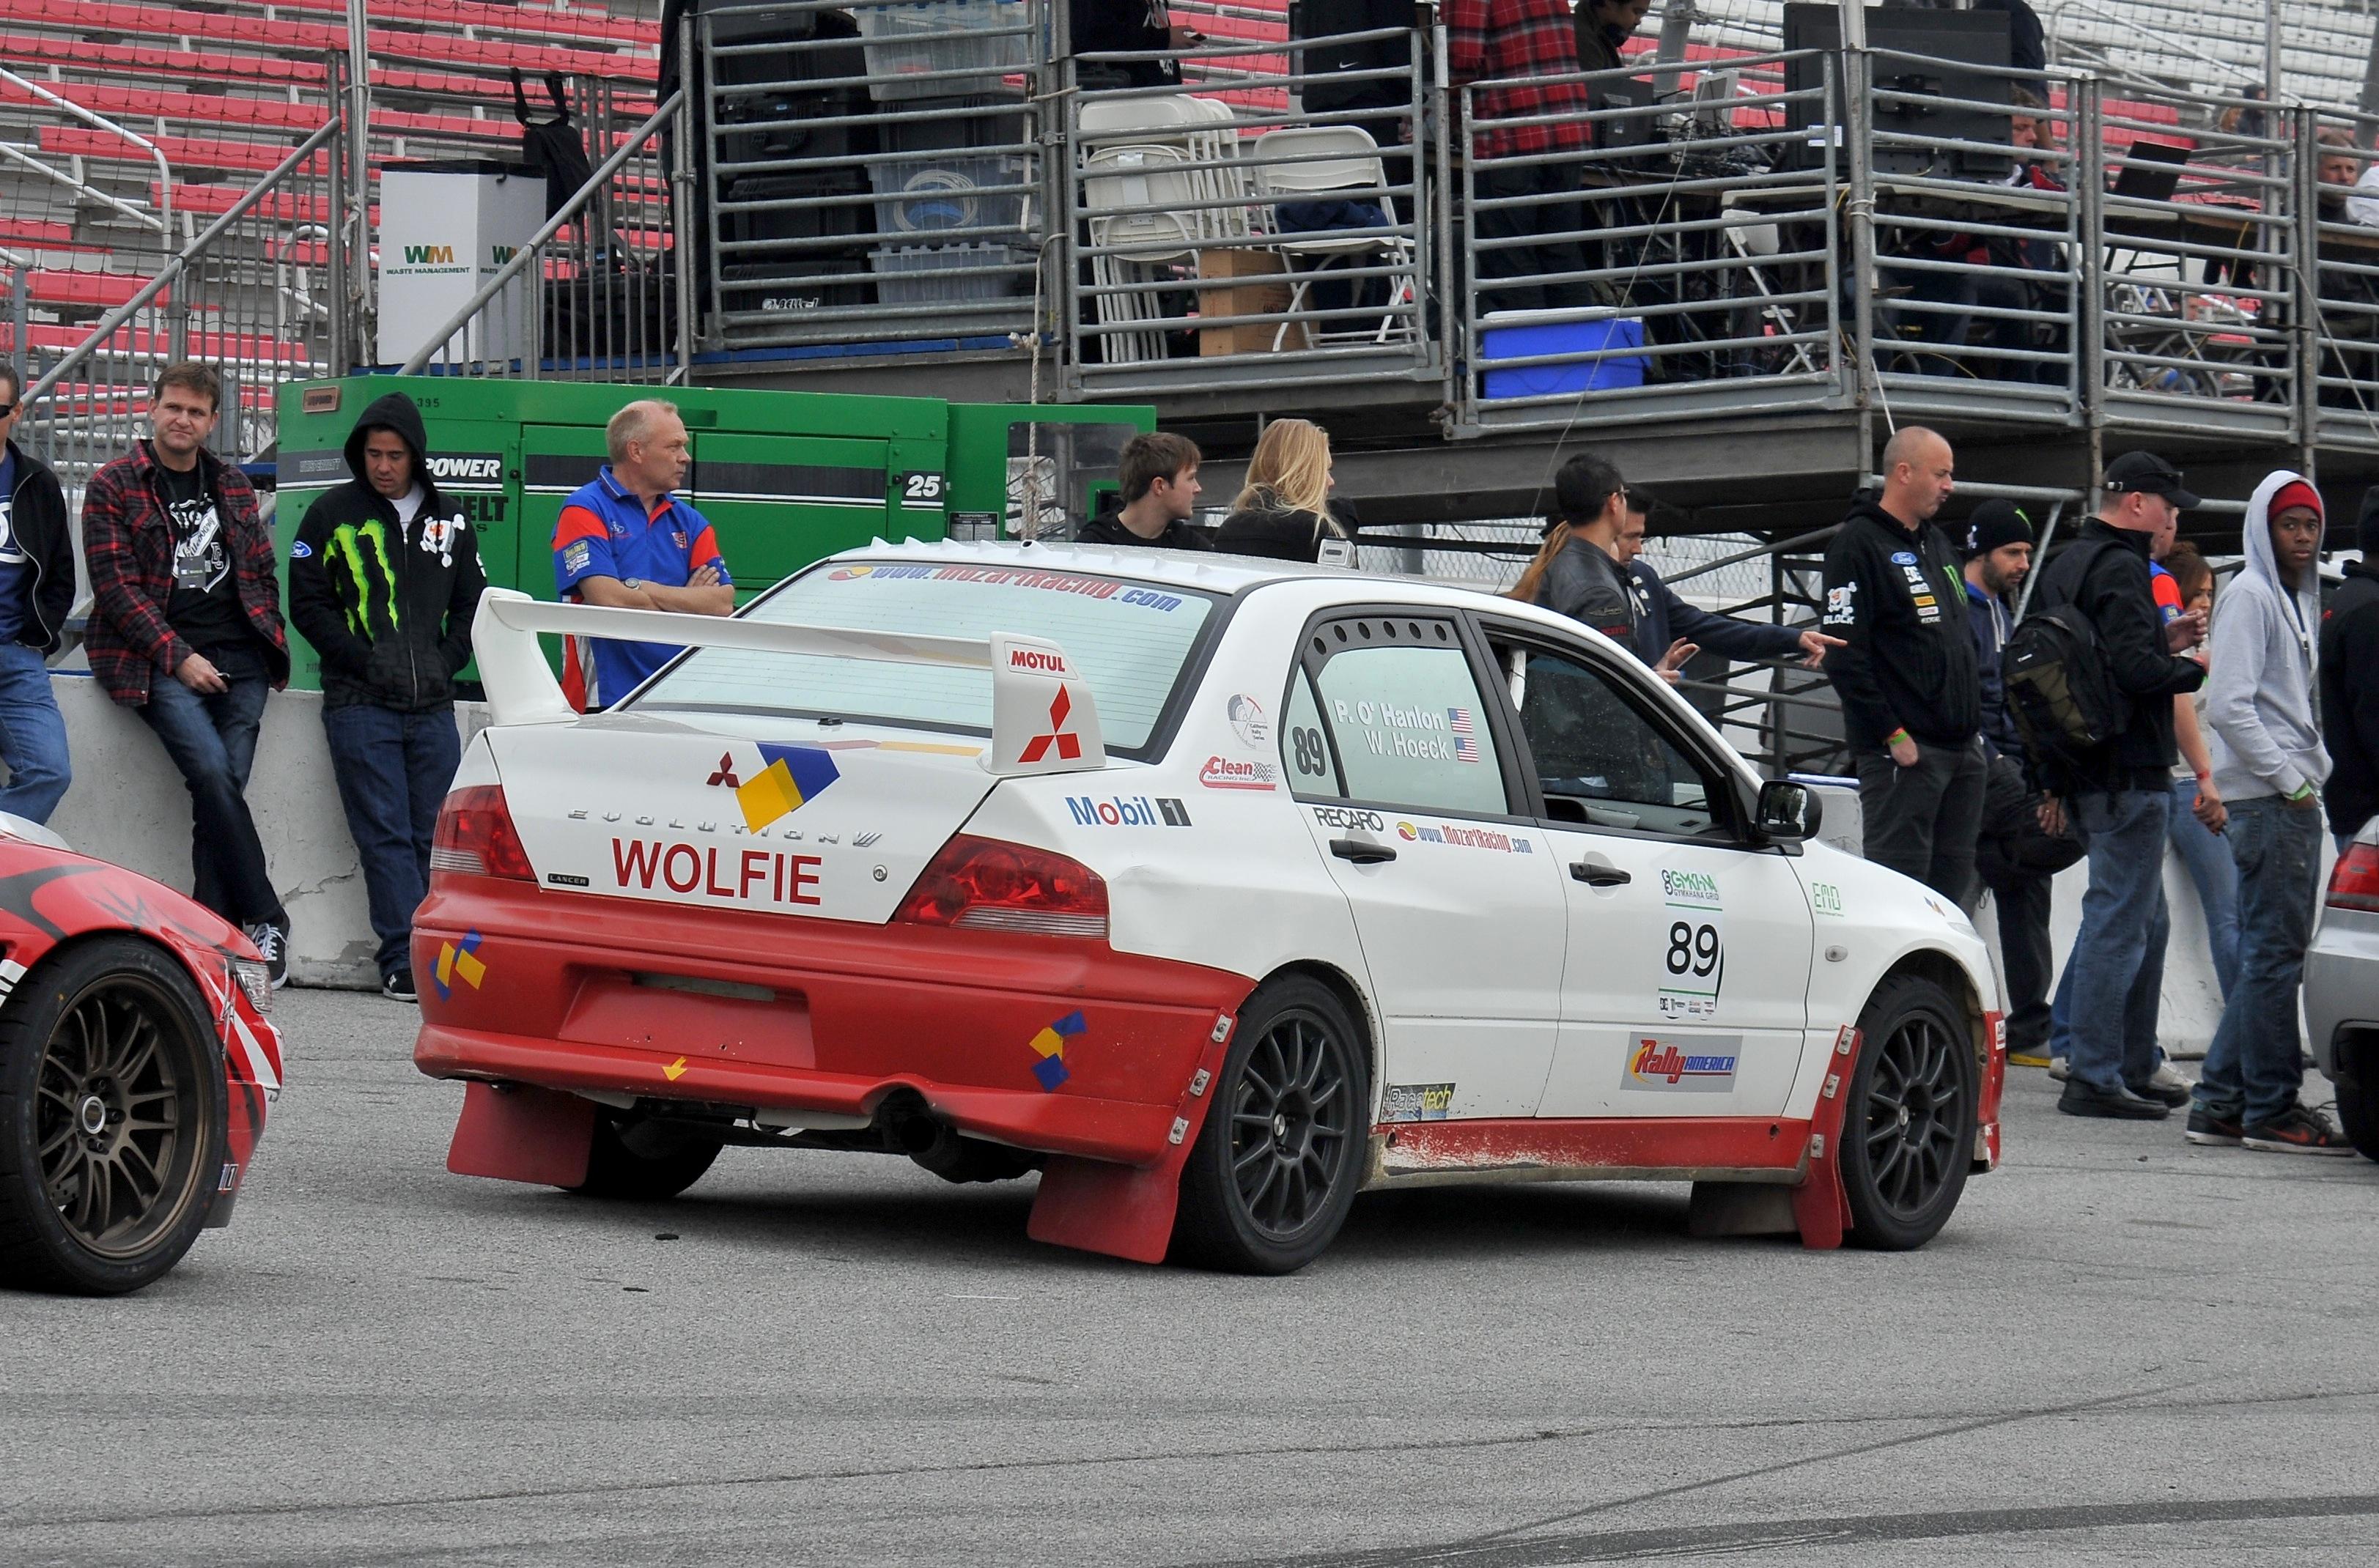 Wolfgang Hoeck, Wolfie, Mitsubishi Evo8, gymkhana